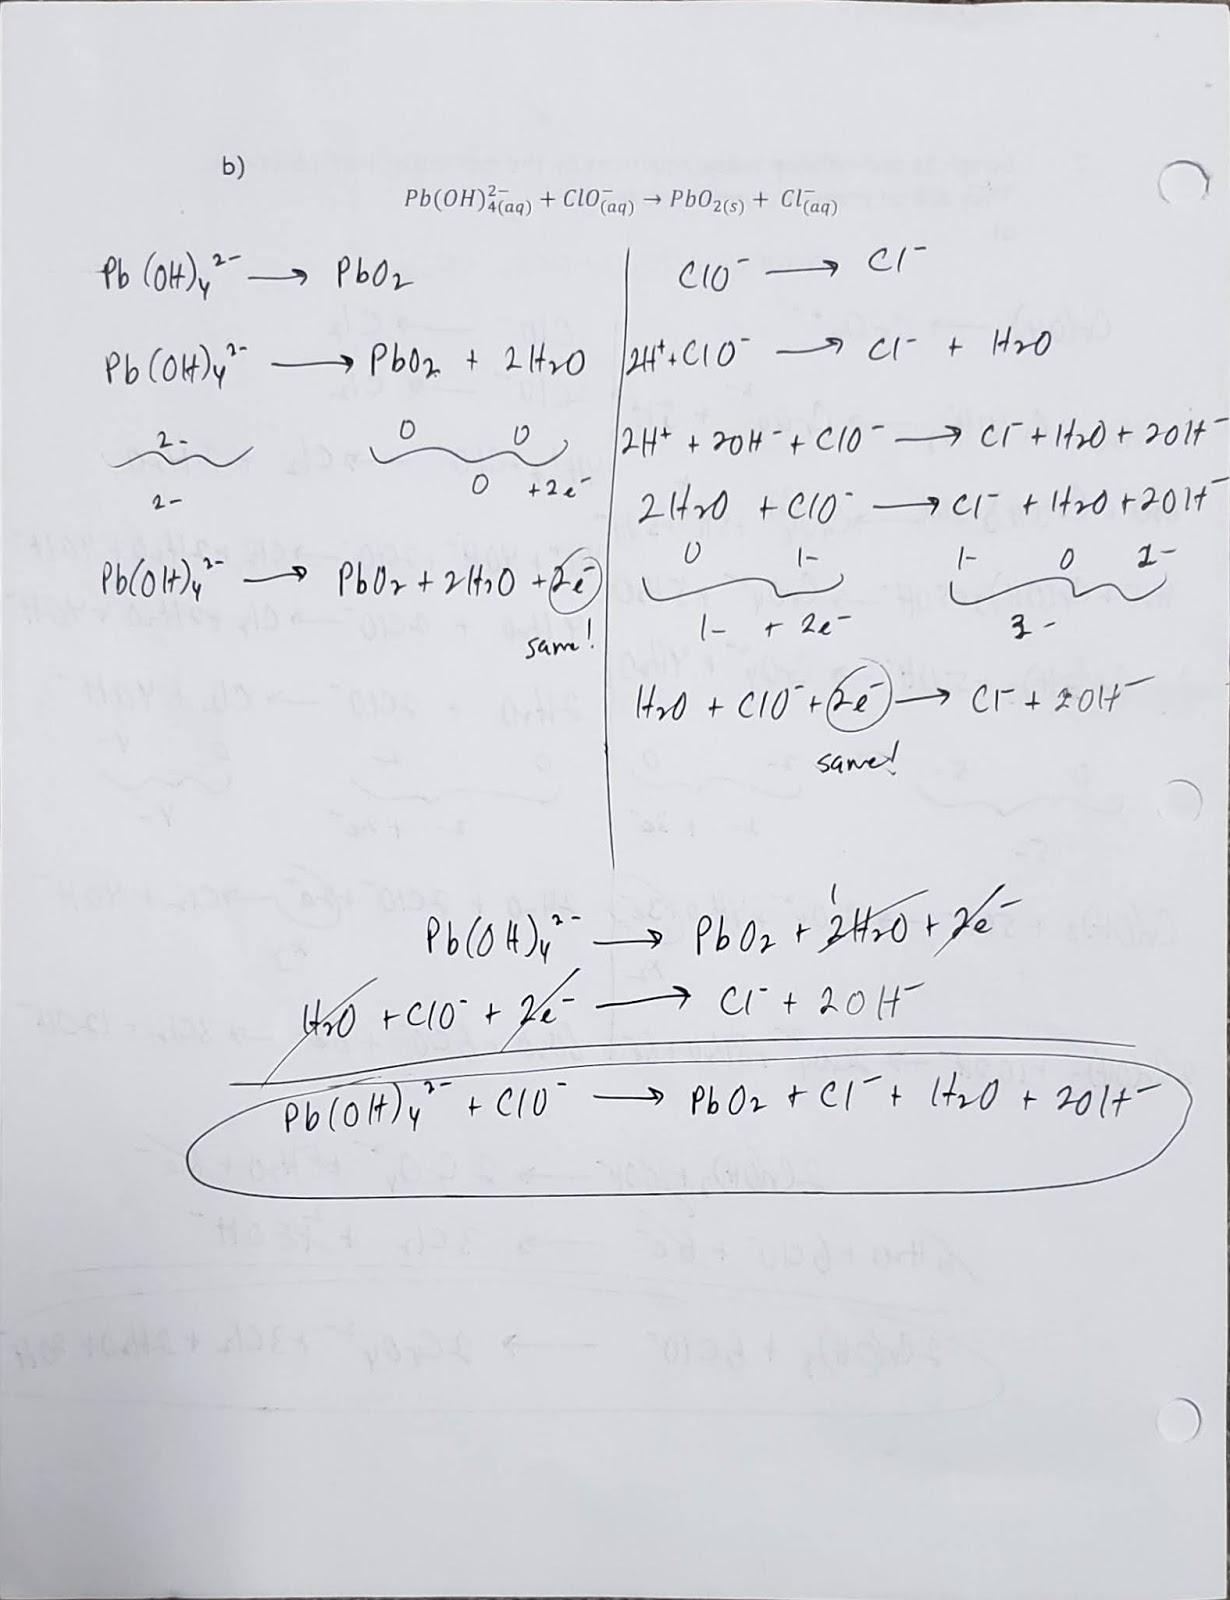 Mr Kasprick S Chemistry 30 Class Ec1 Investigate The